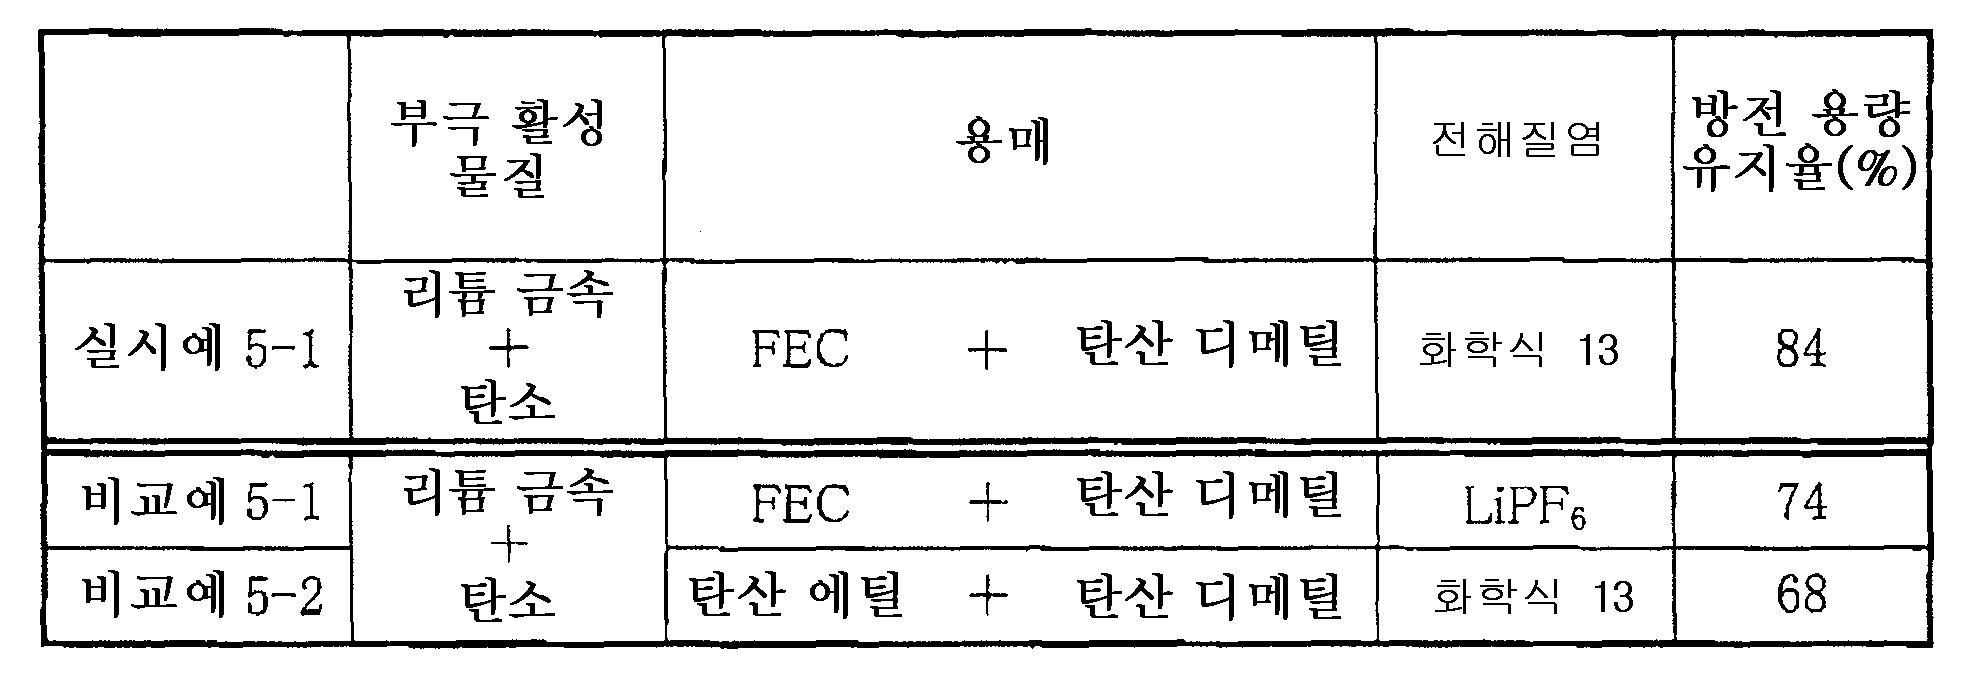 Figure 112005071934575-pat00033